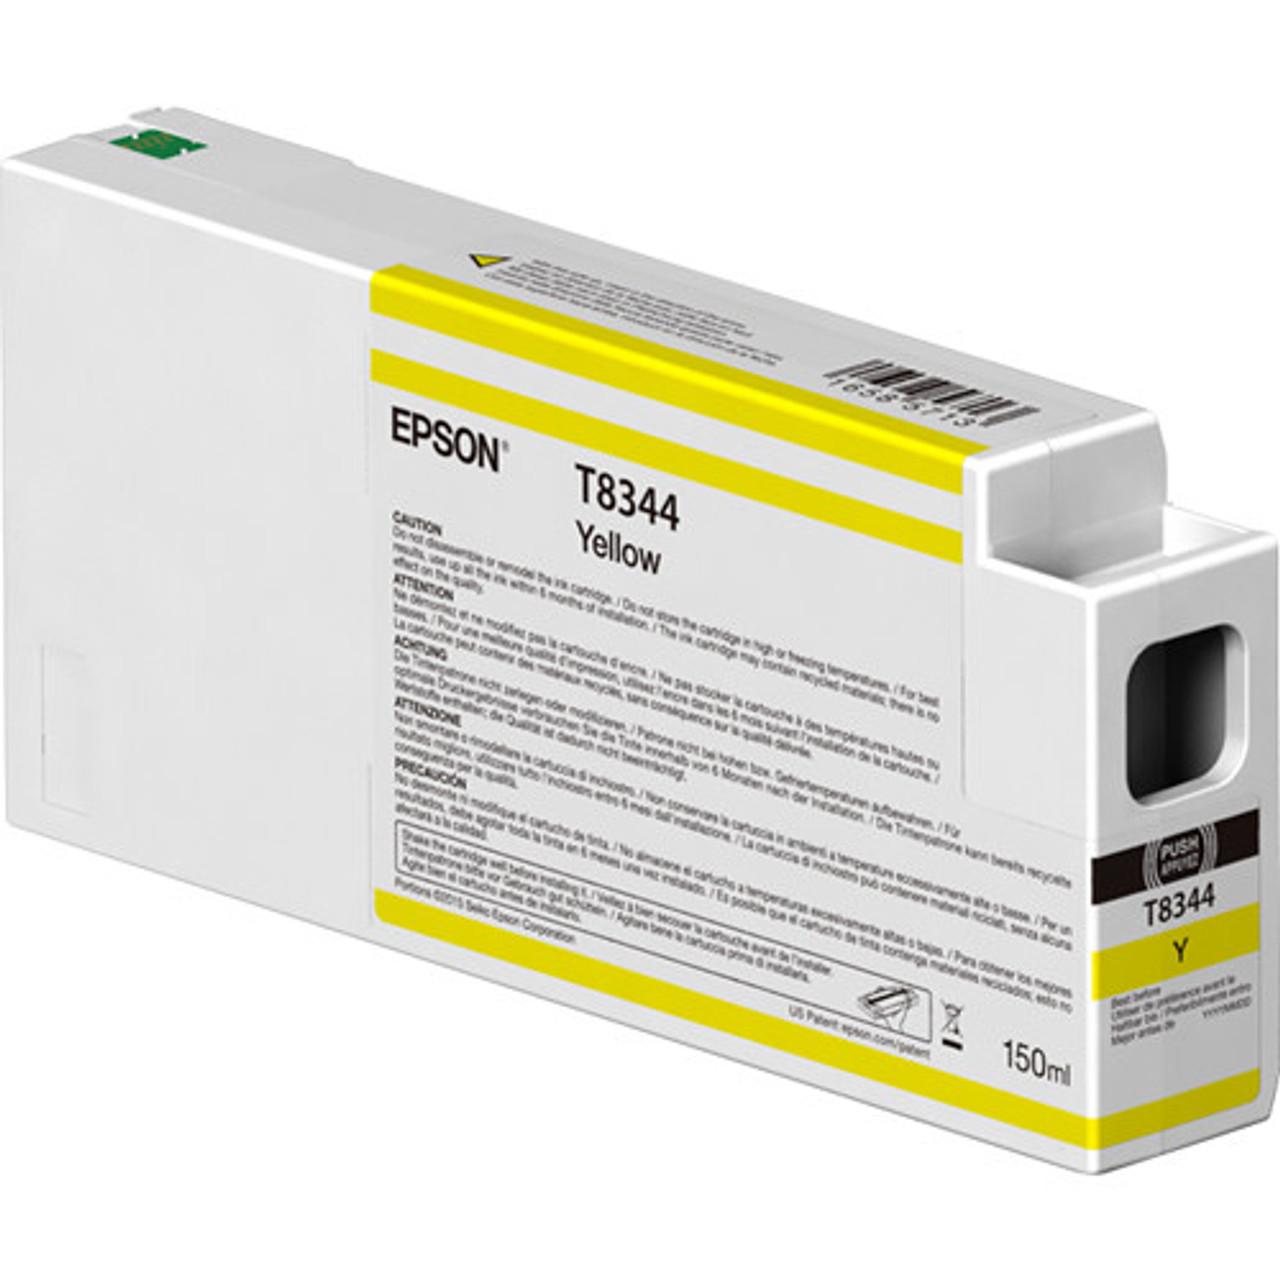 Epson T834400 UltraChrome HD Yellow Ink Cartridge (150ml)